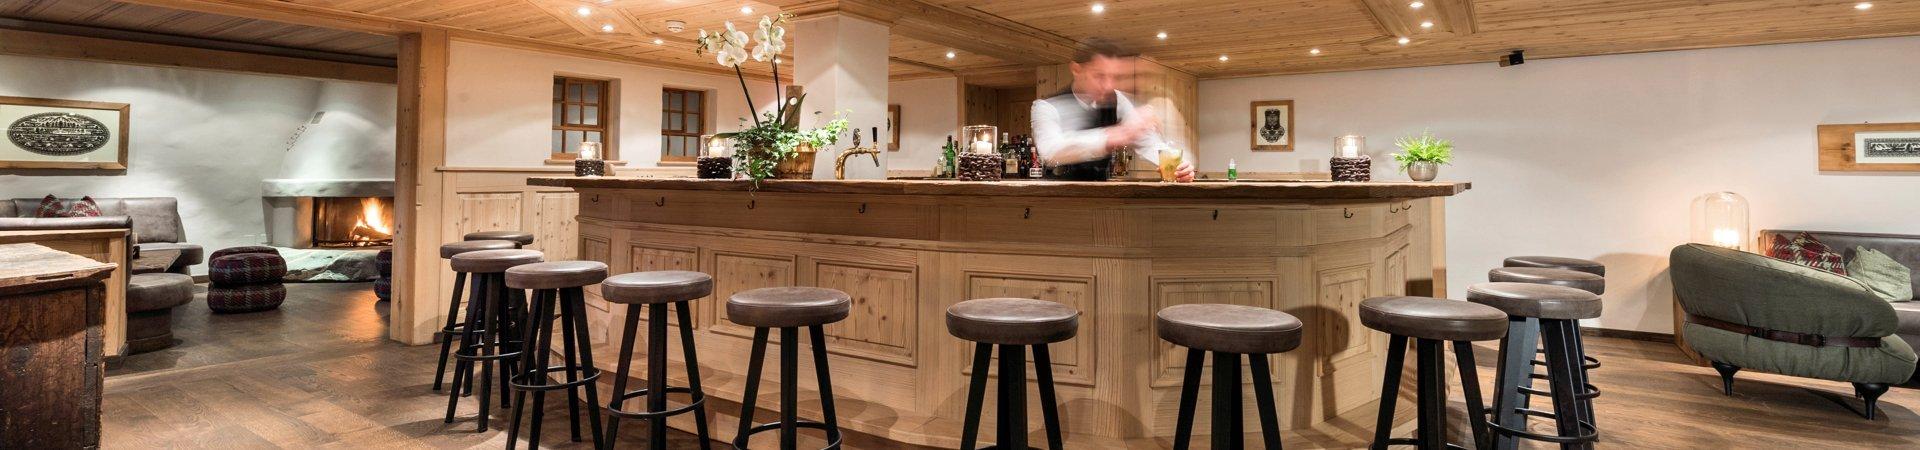 Bar & Kamin - Romantik Hotel Hornberg Saanenmoeser Gstaad Romantik ...